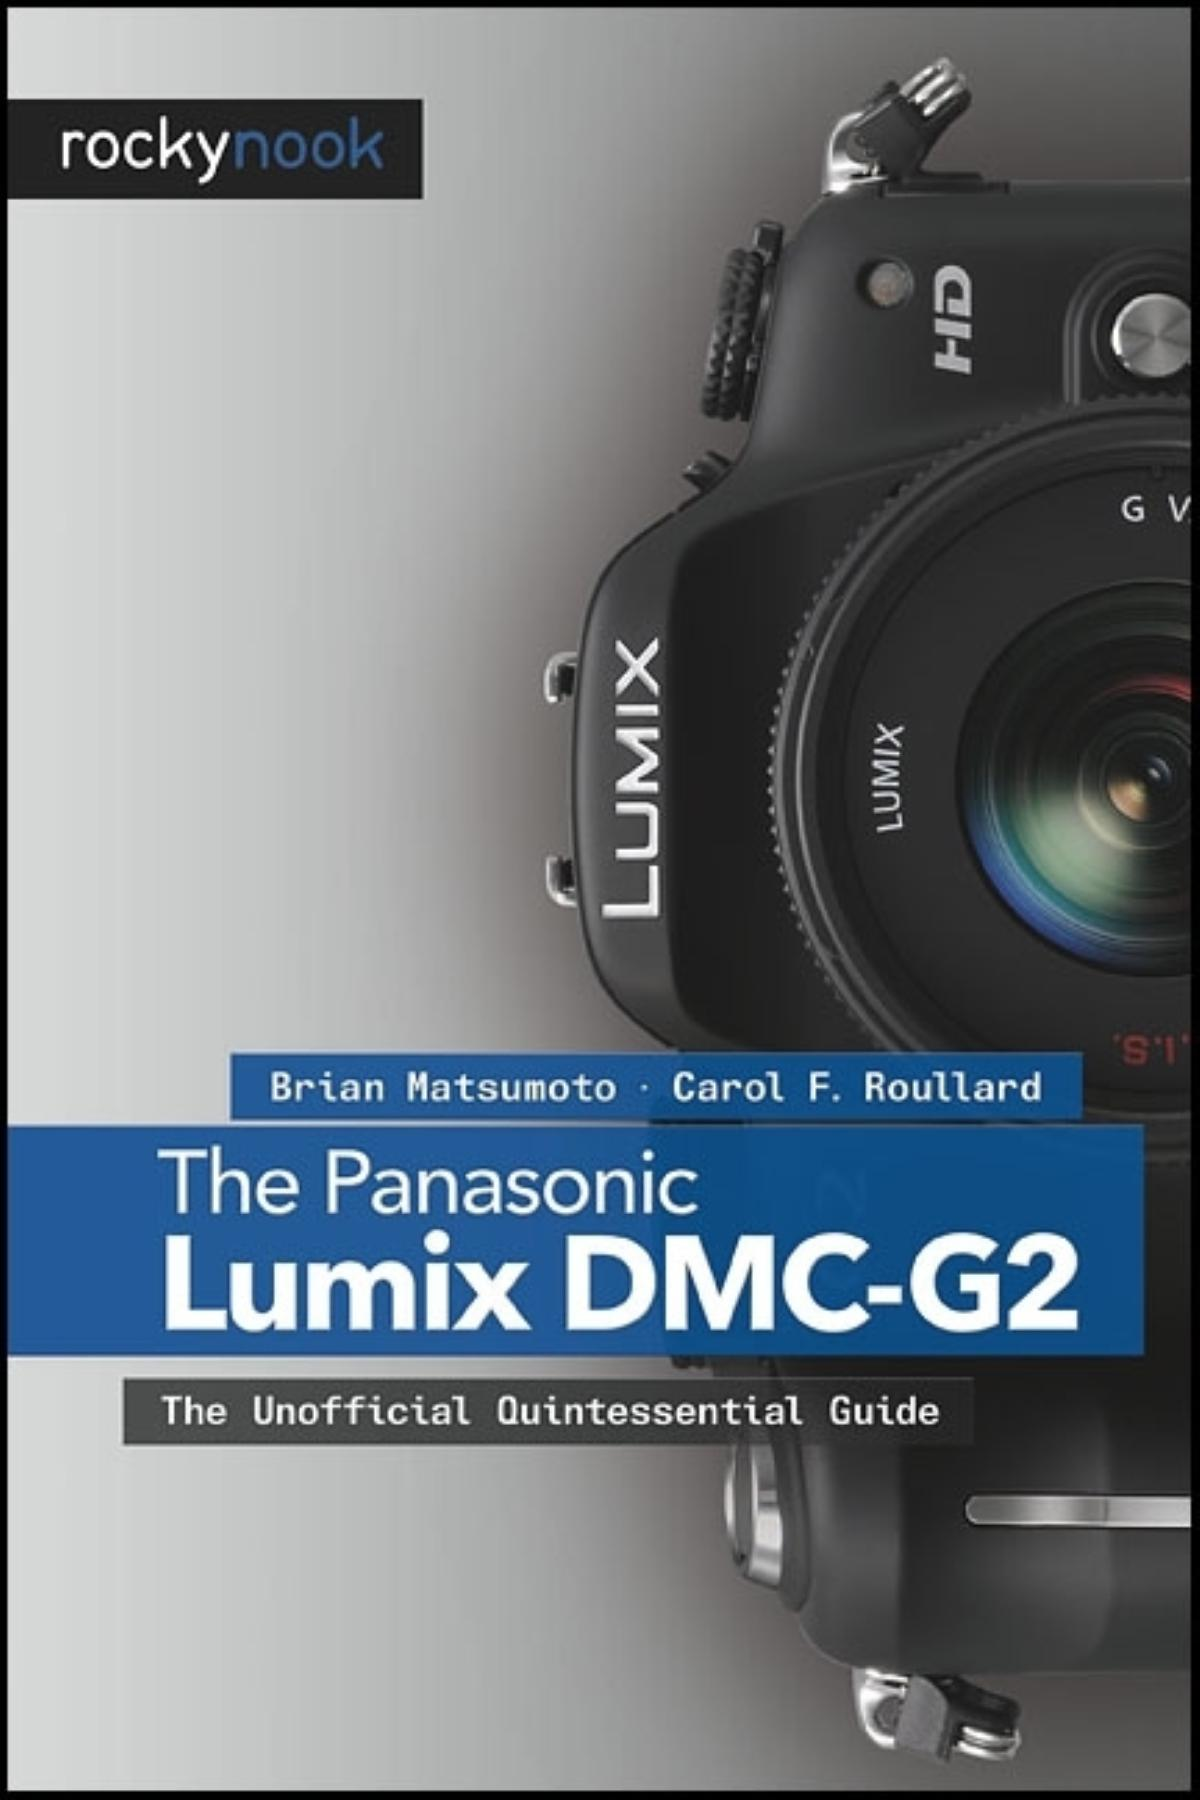 The Panasonic Lumix DMC-G2 (96504515) photo